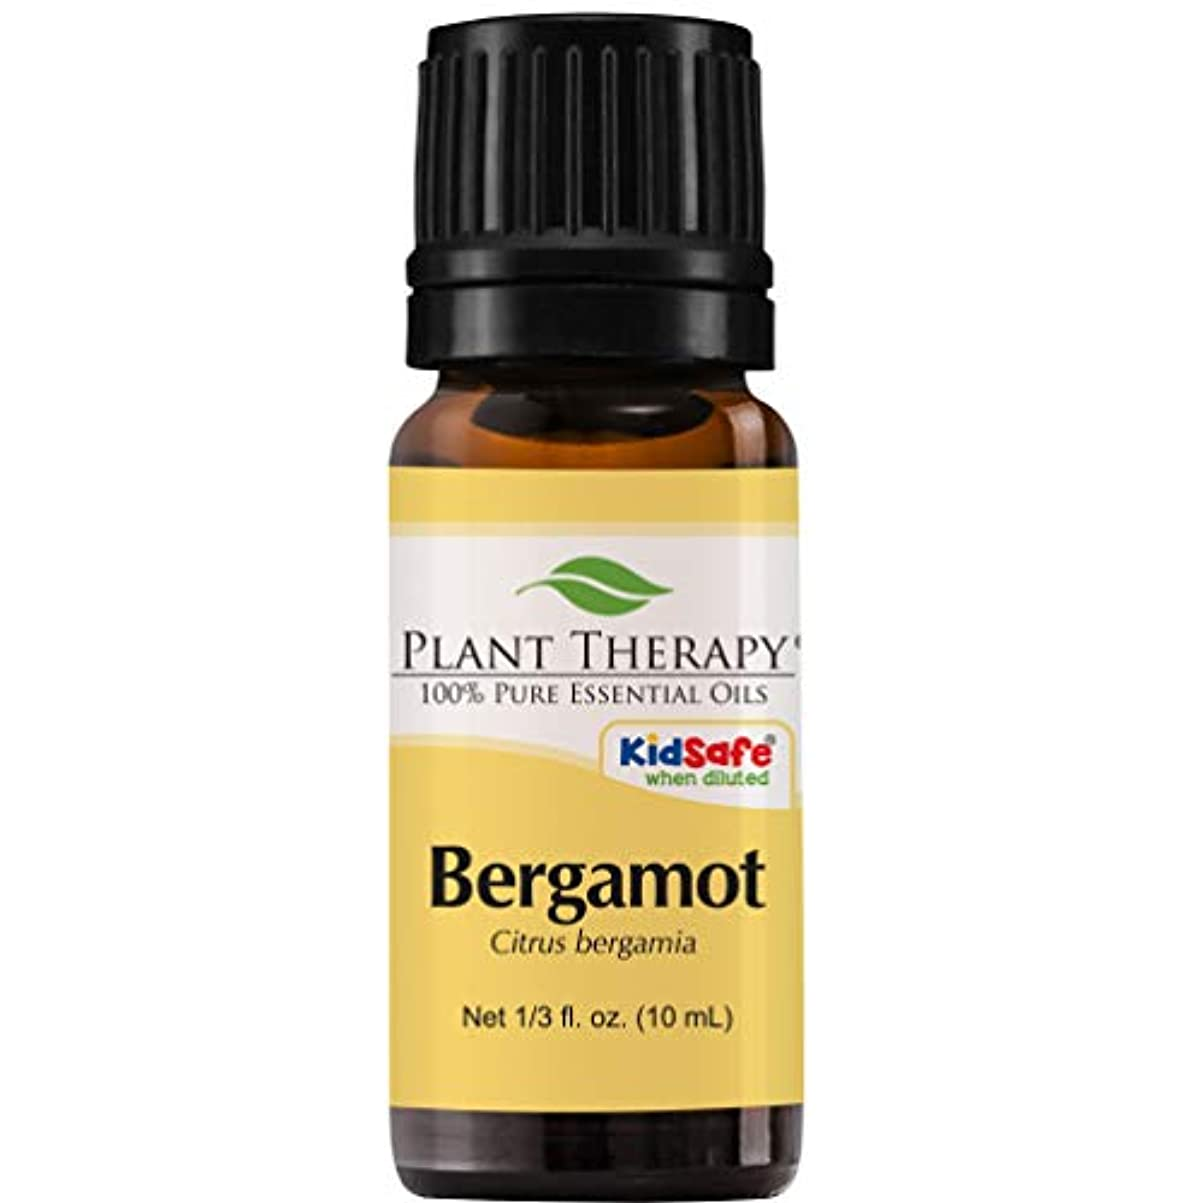 Plant Therapy Essential Oils (プラントセラピー エッセンシャルオイル) ベルガモット エッセンシャルオイル